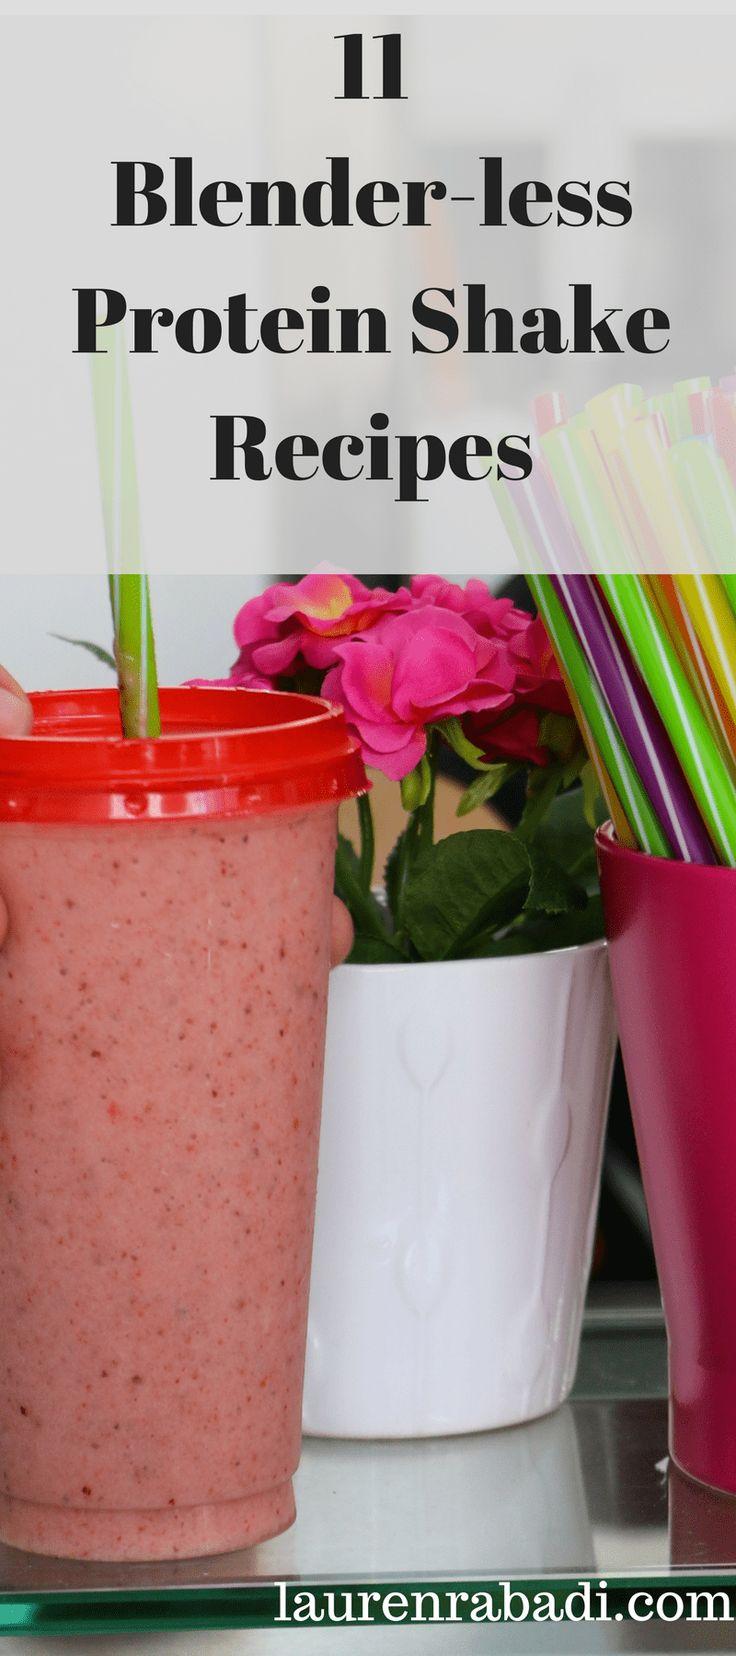 11 Blender-less Protein Shake Recipes Using My Blender Bottle #proteinshake #weightloss #healthyrecipes